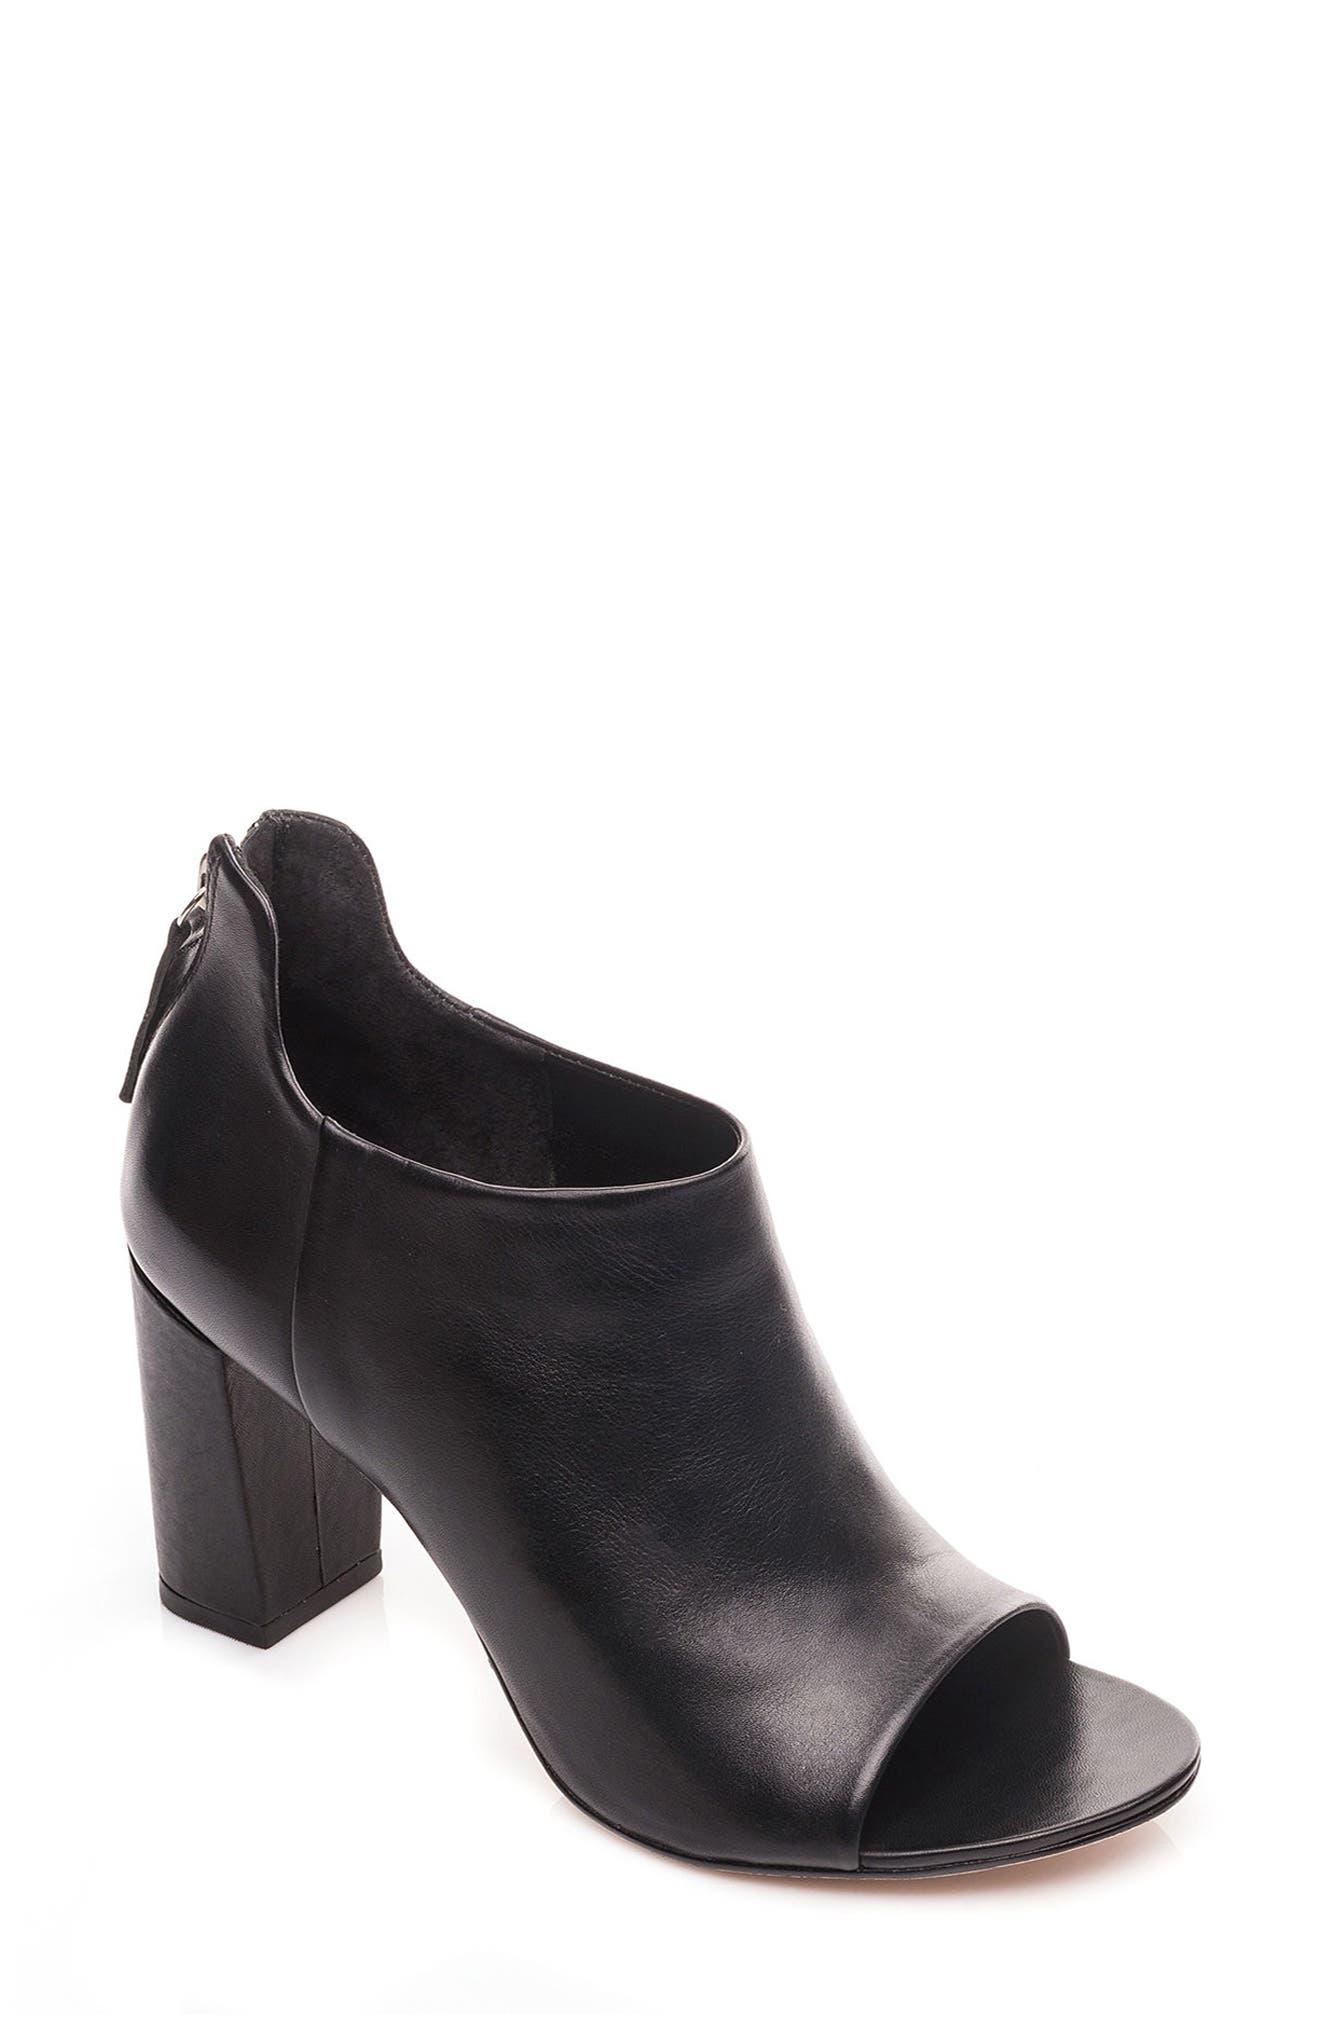 Heather Peep Toe Bootie,                             Main thumbnail 1, color,                             Black Leather